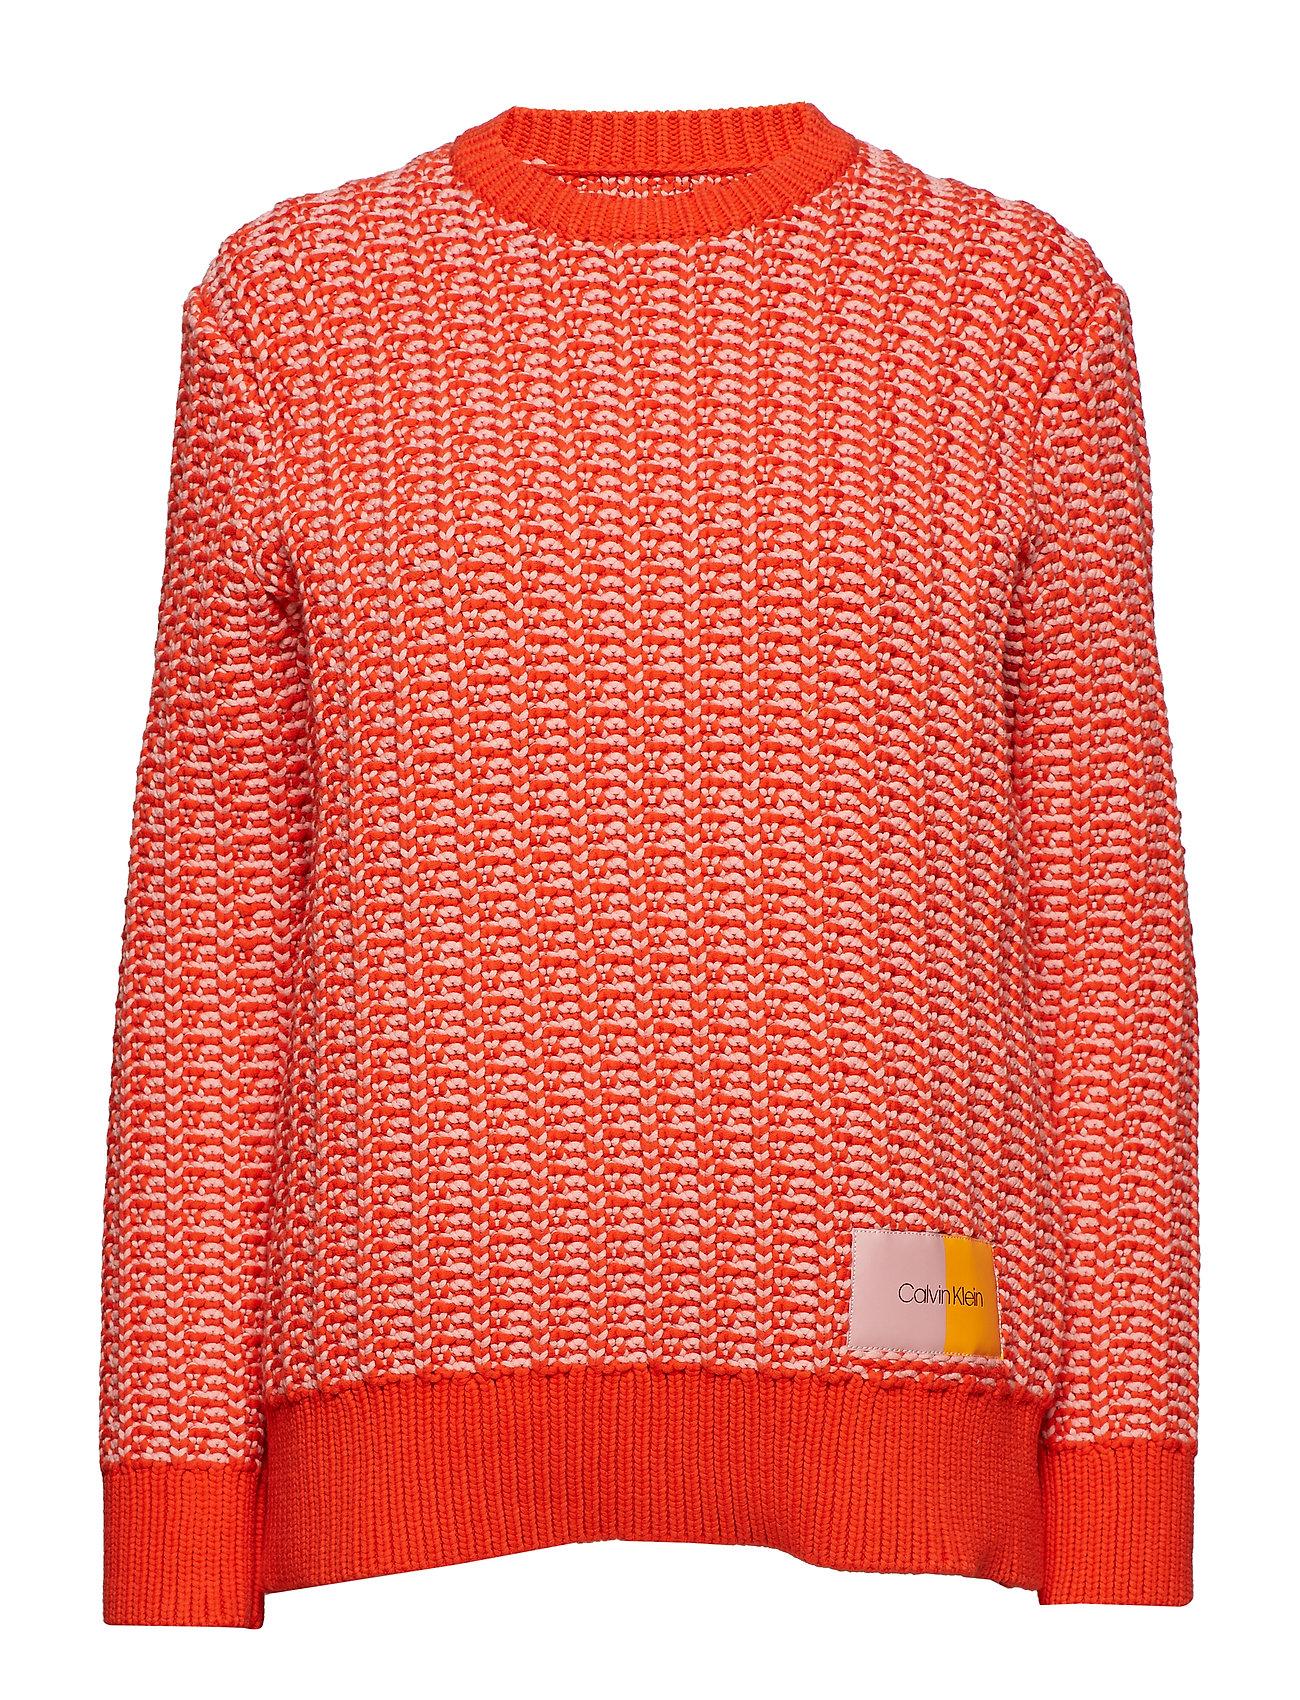 nkacid C Klein Novelty OrangeBlushCalvin Stitch thQrCds